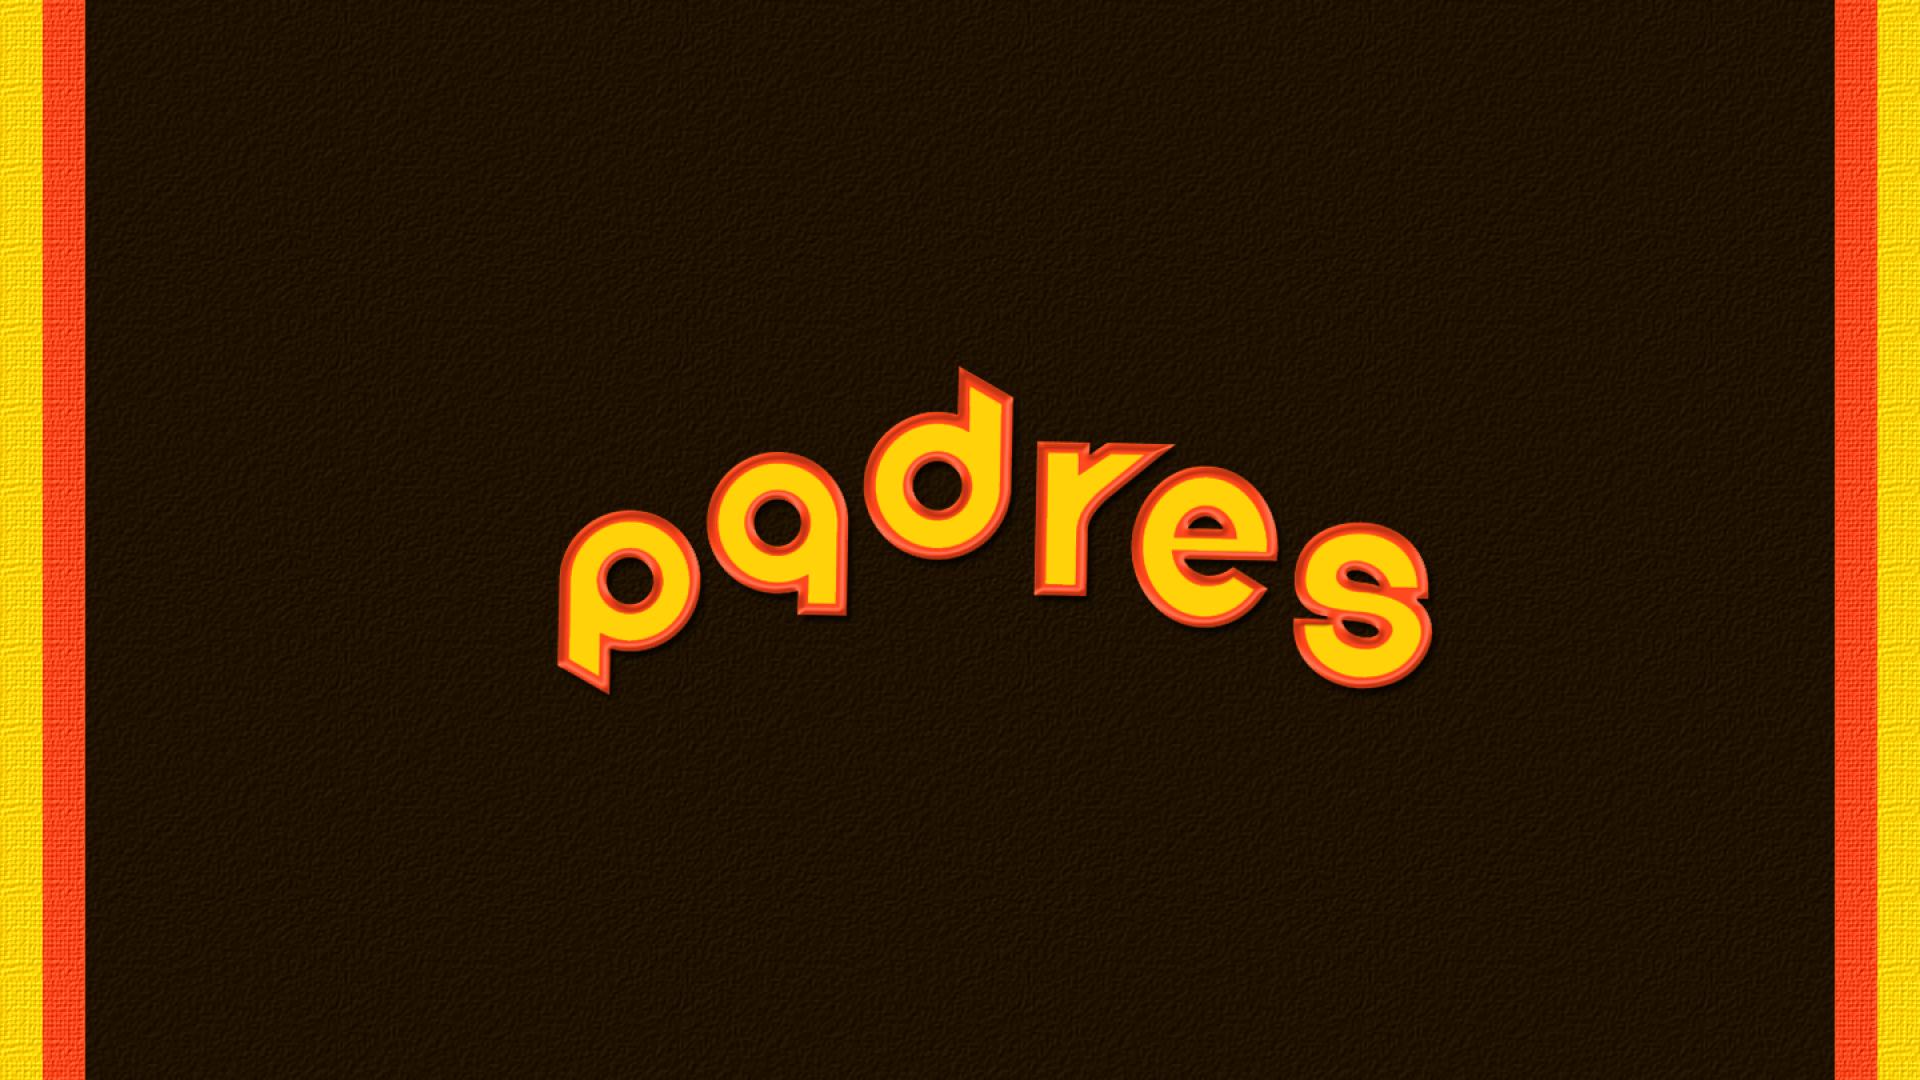 Retro San Diego Padres Wallpaper 22629